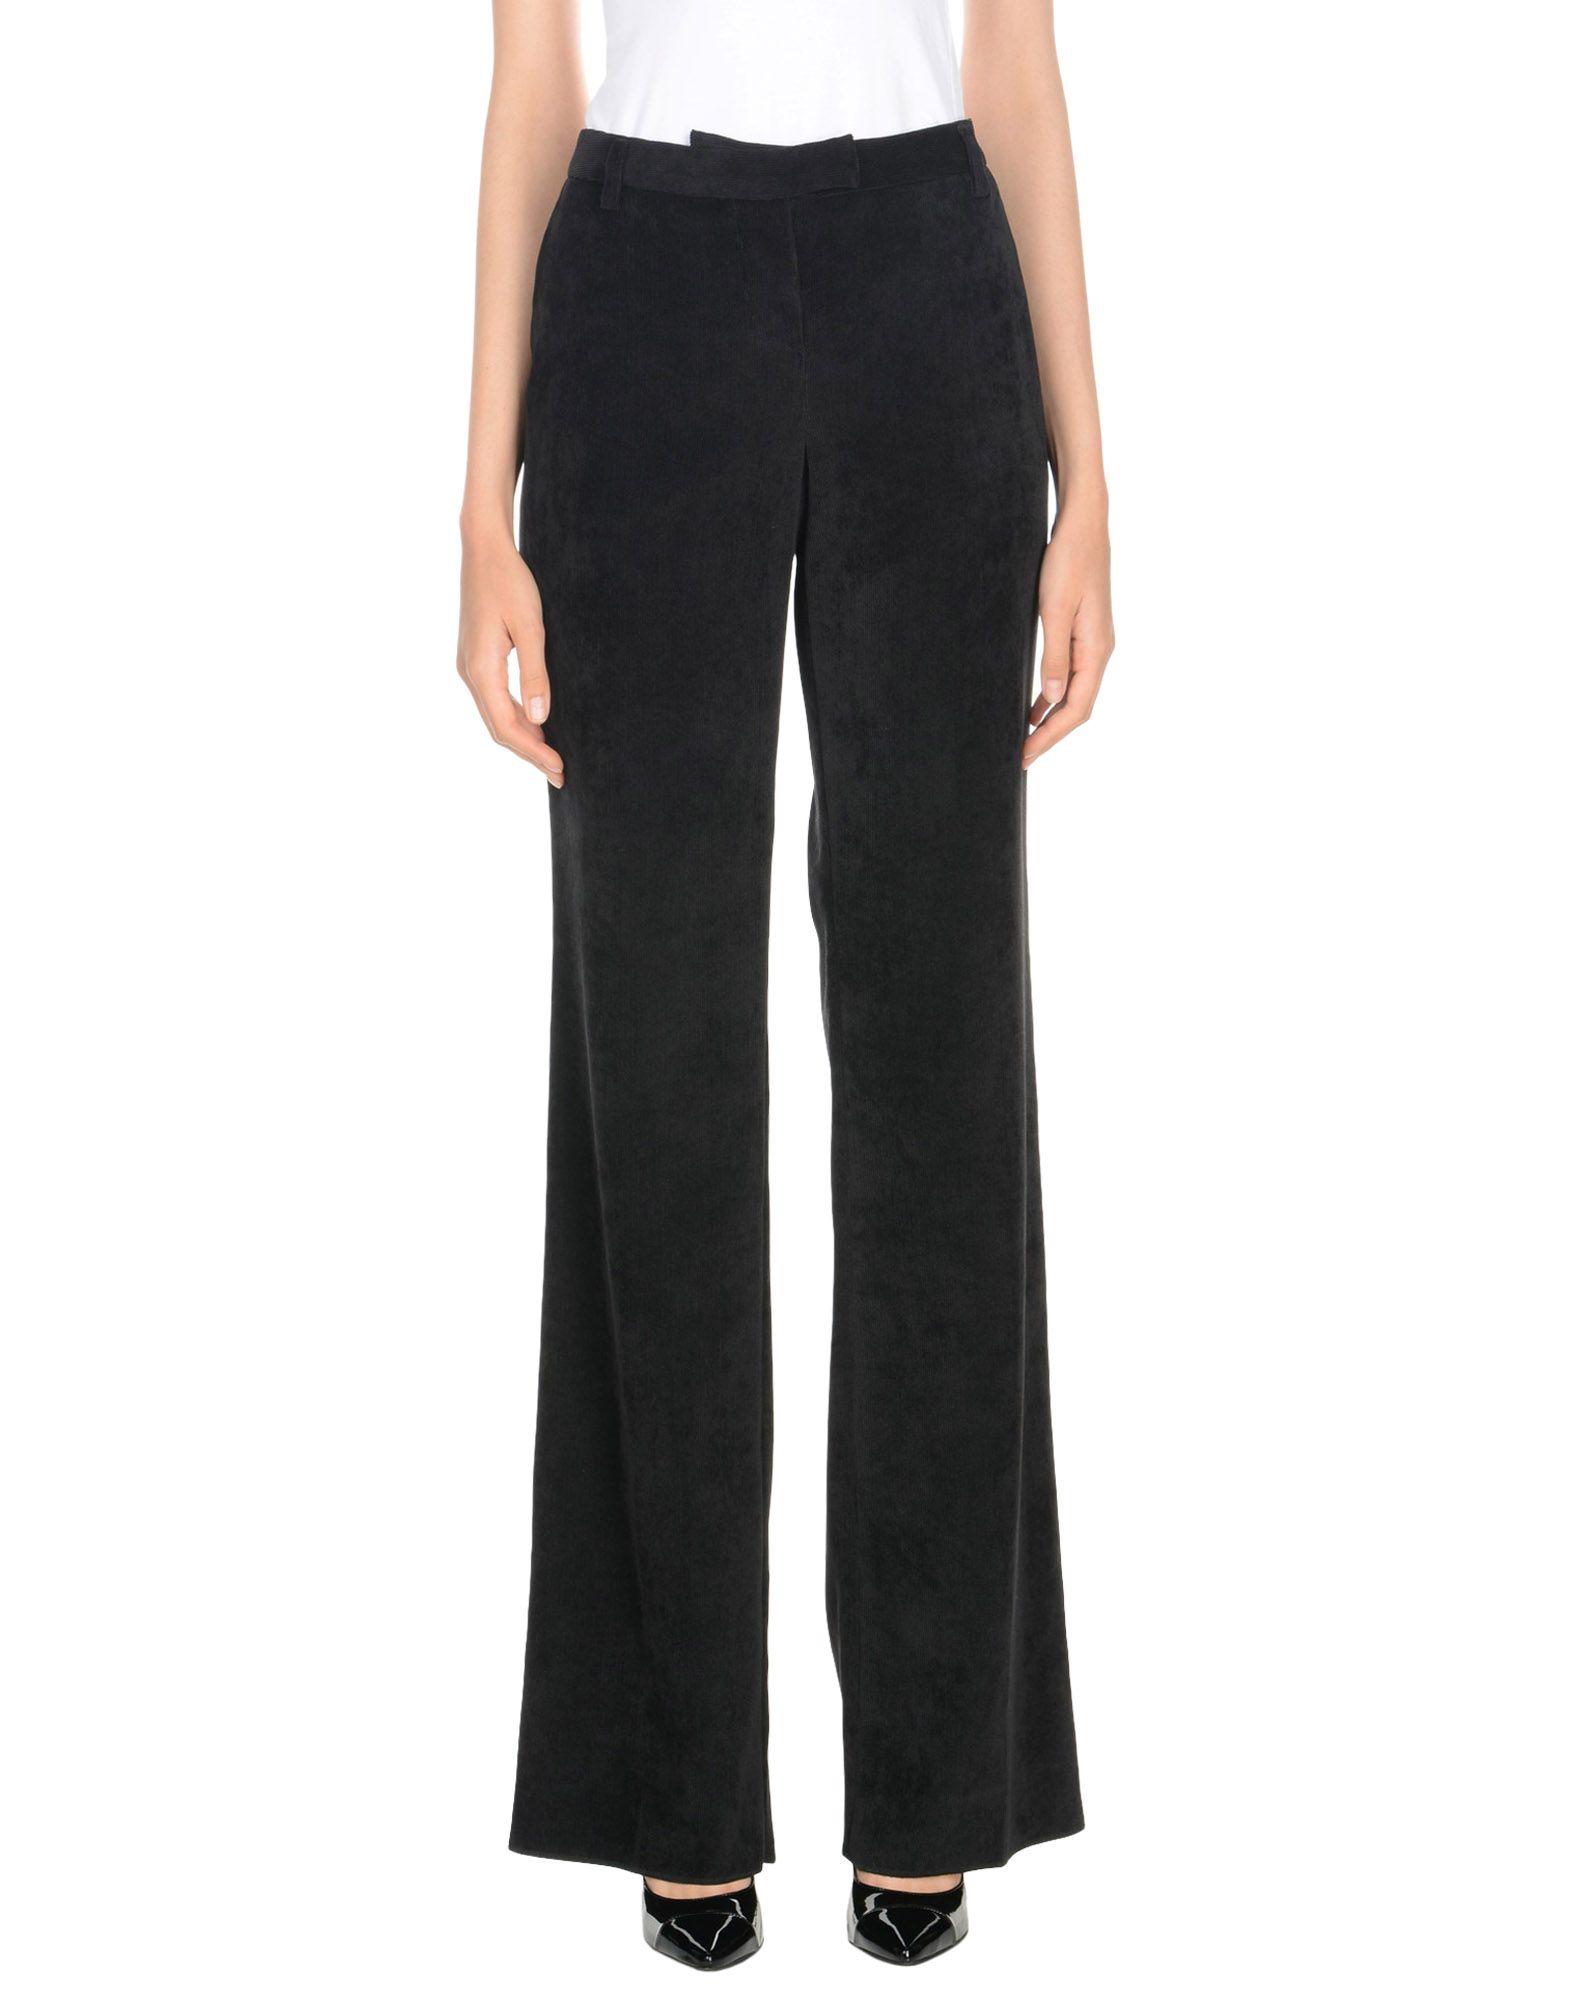 Pantalone Just Cavalli Donna - Acquista online su x8HTvR